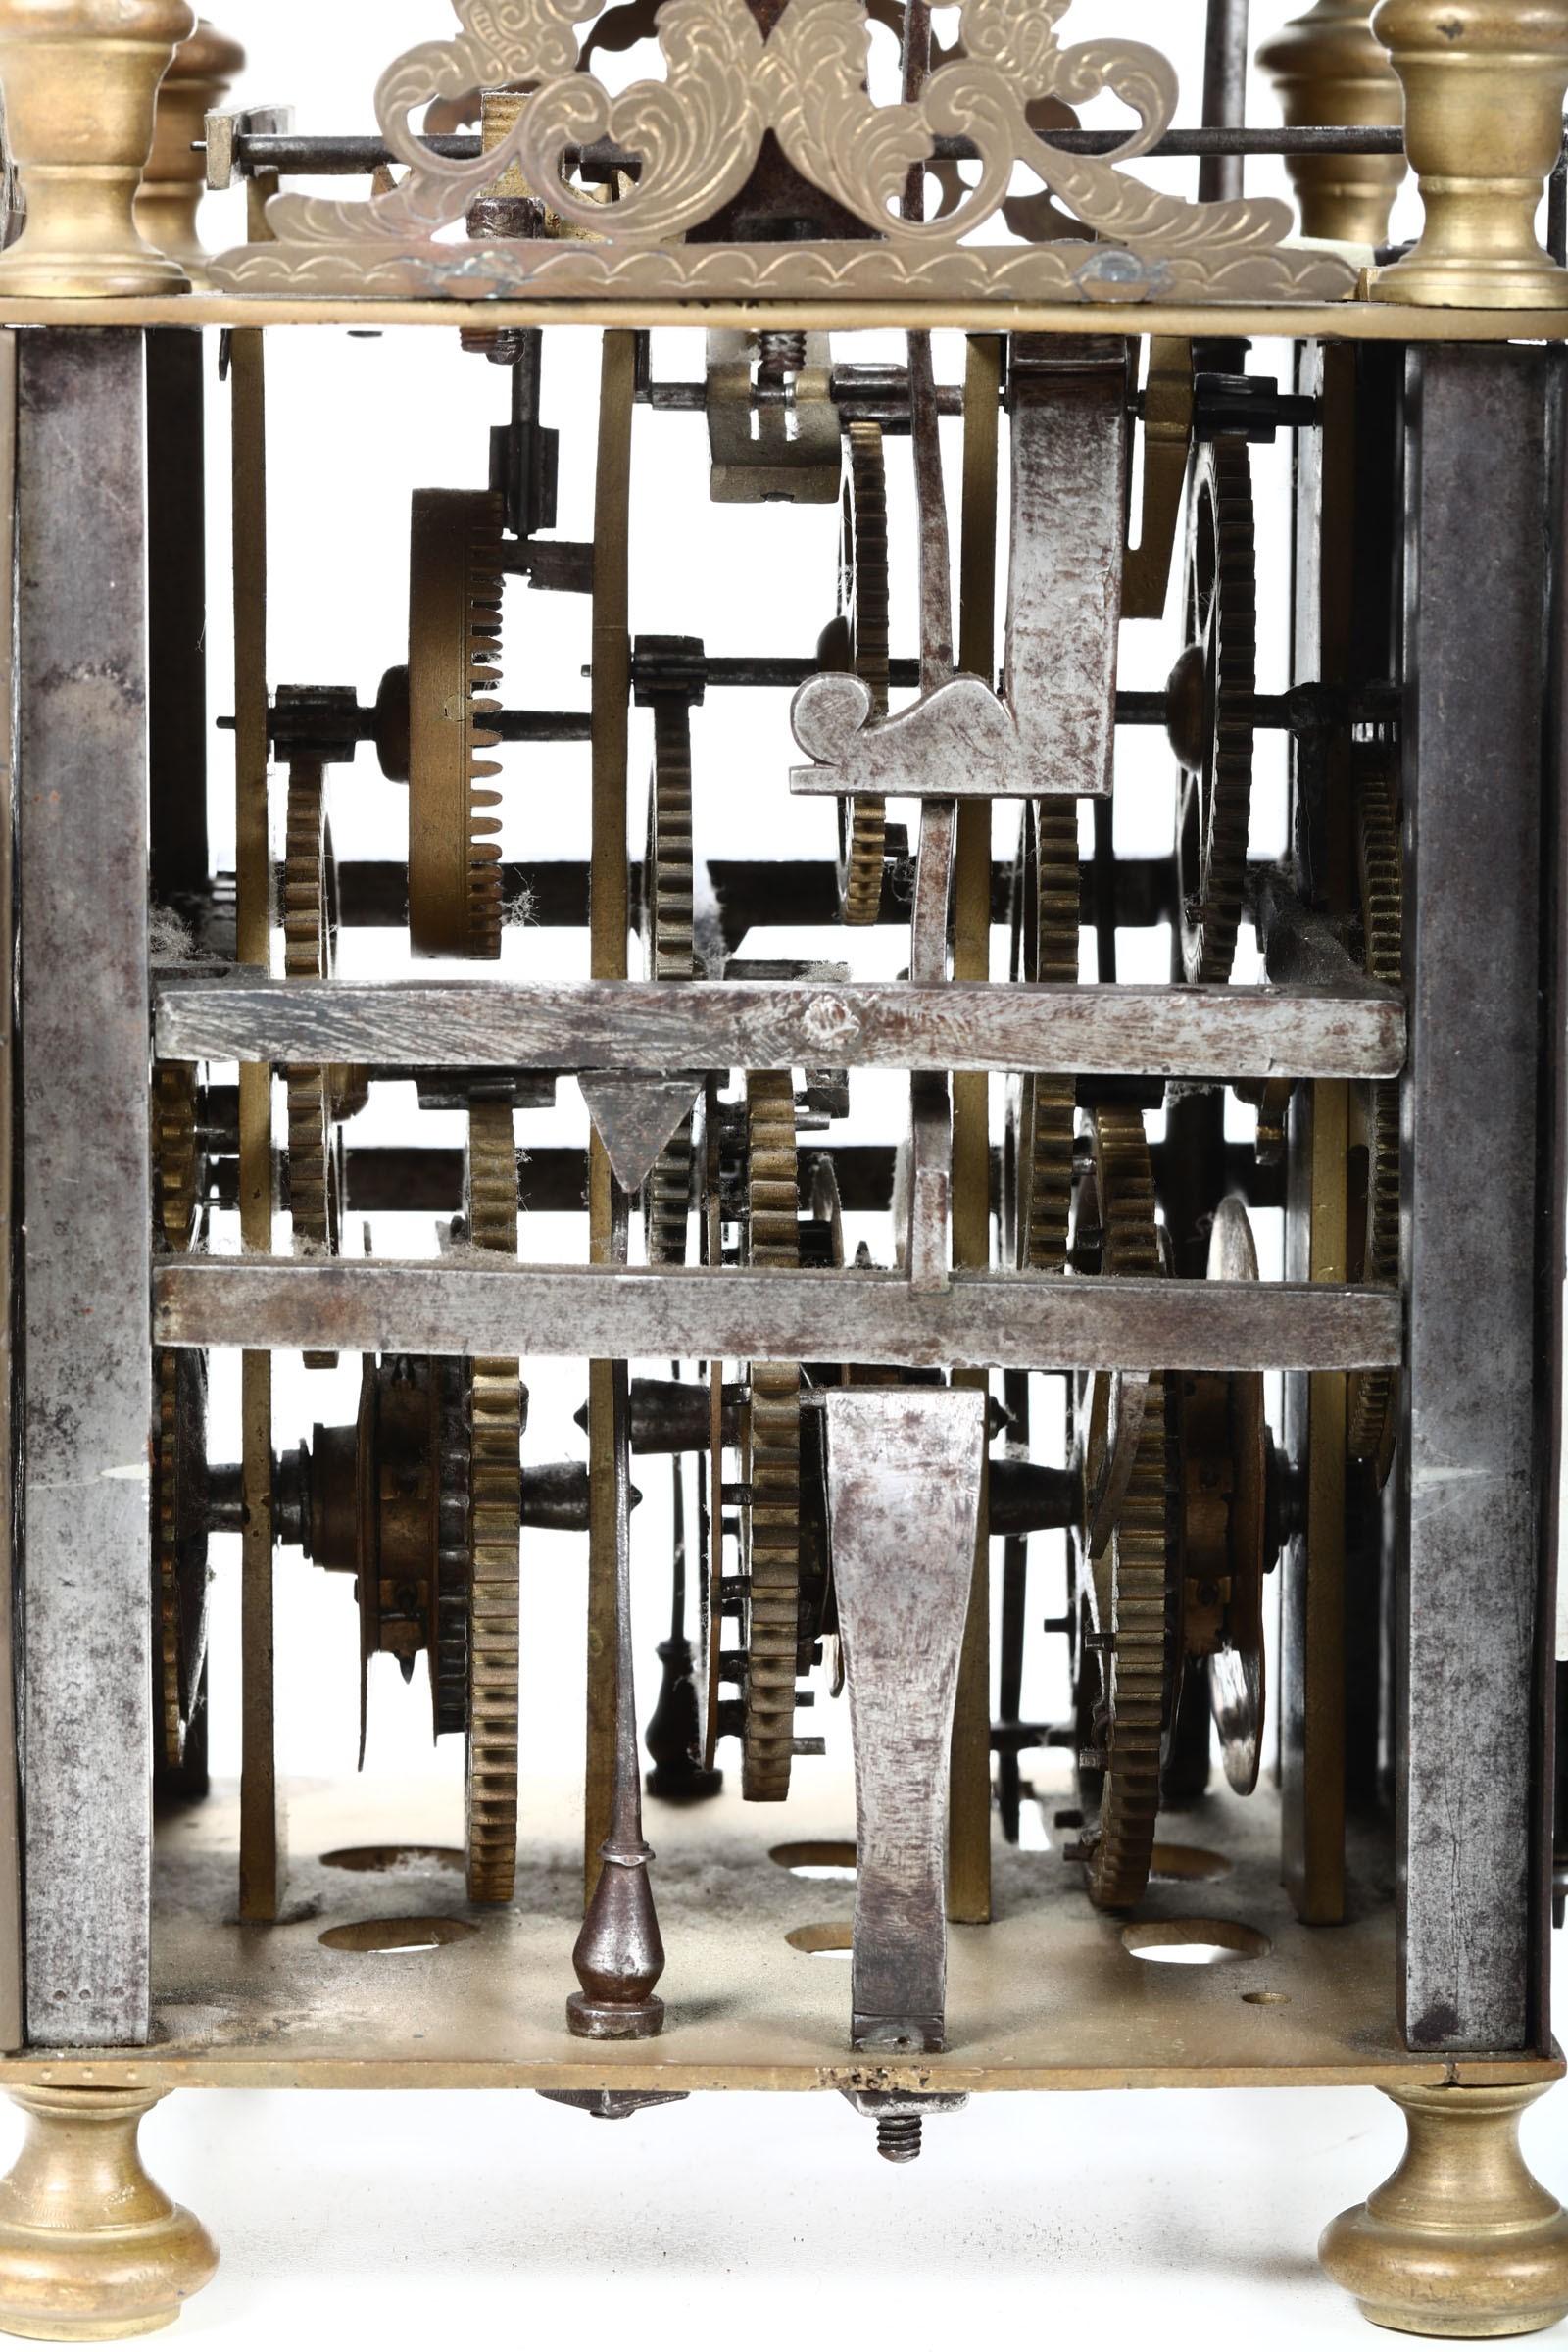 Lot 146 - Orologio a lanterna, Paulus Botti, Napoli XVIII secolo, - Scappamento a verga. [...]